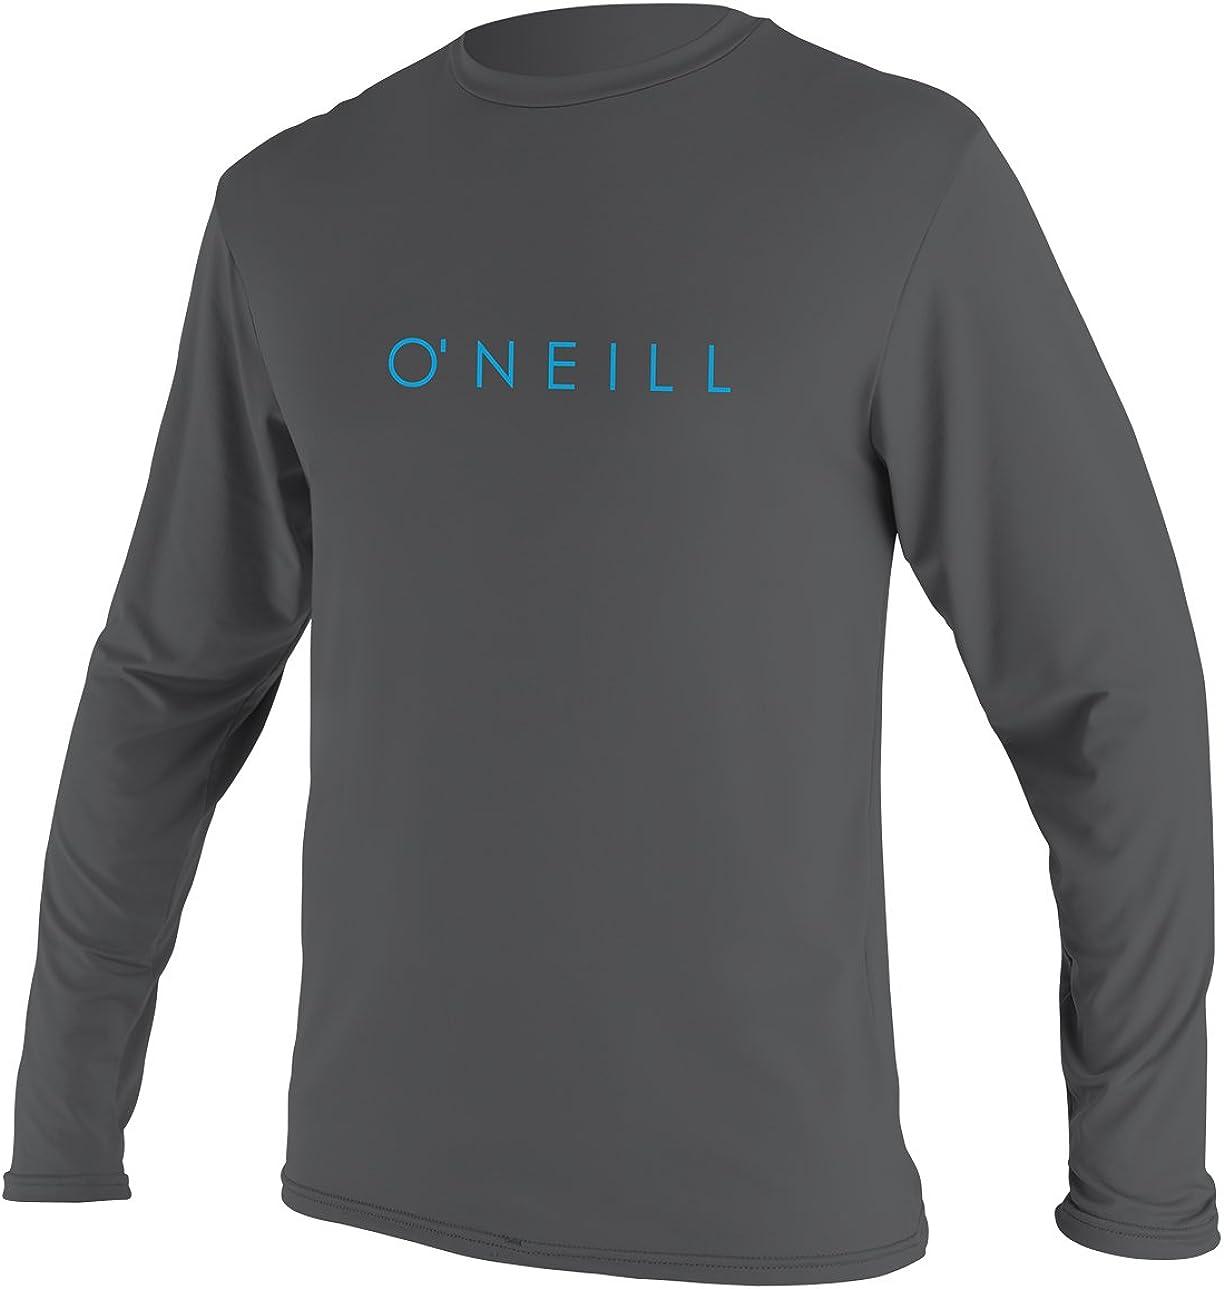 O'Neill Youth Basic Skins Upf 30 + Long Sleeve Sun Shirt